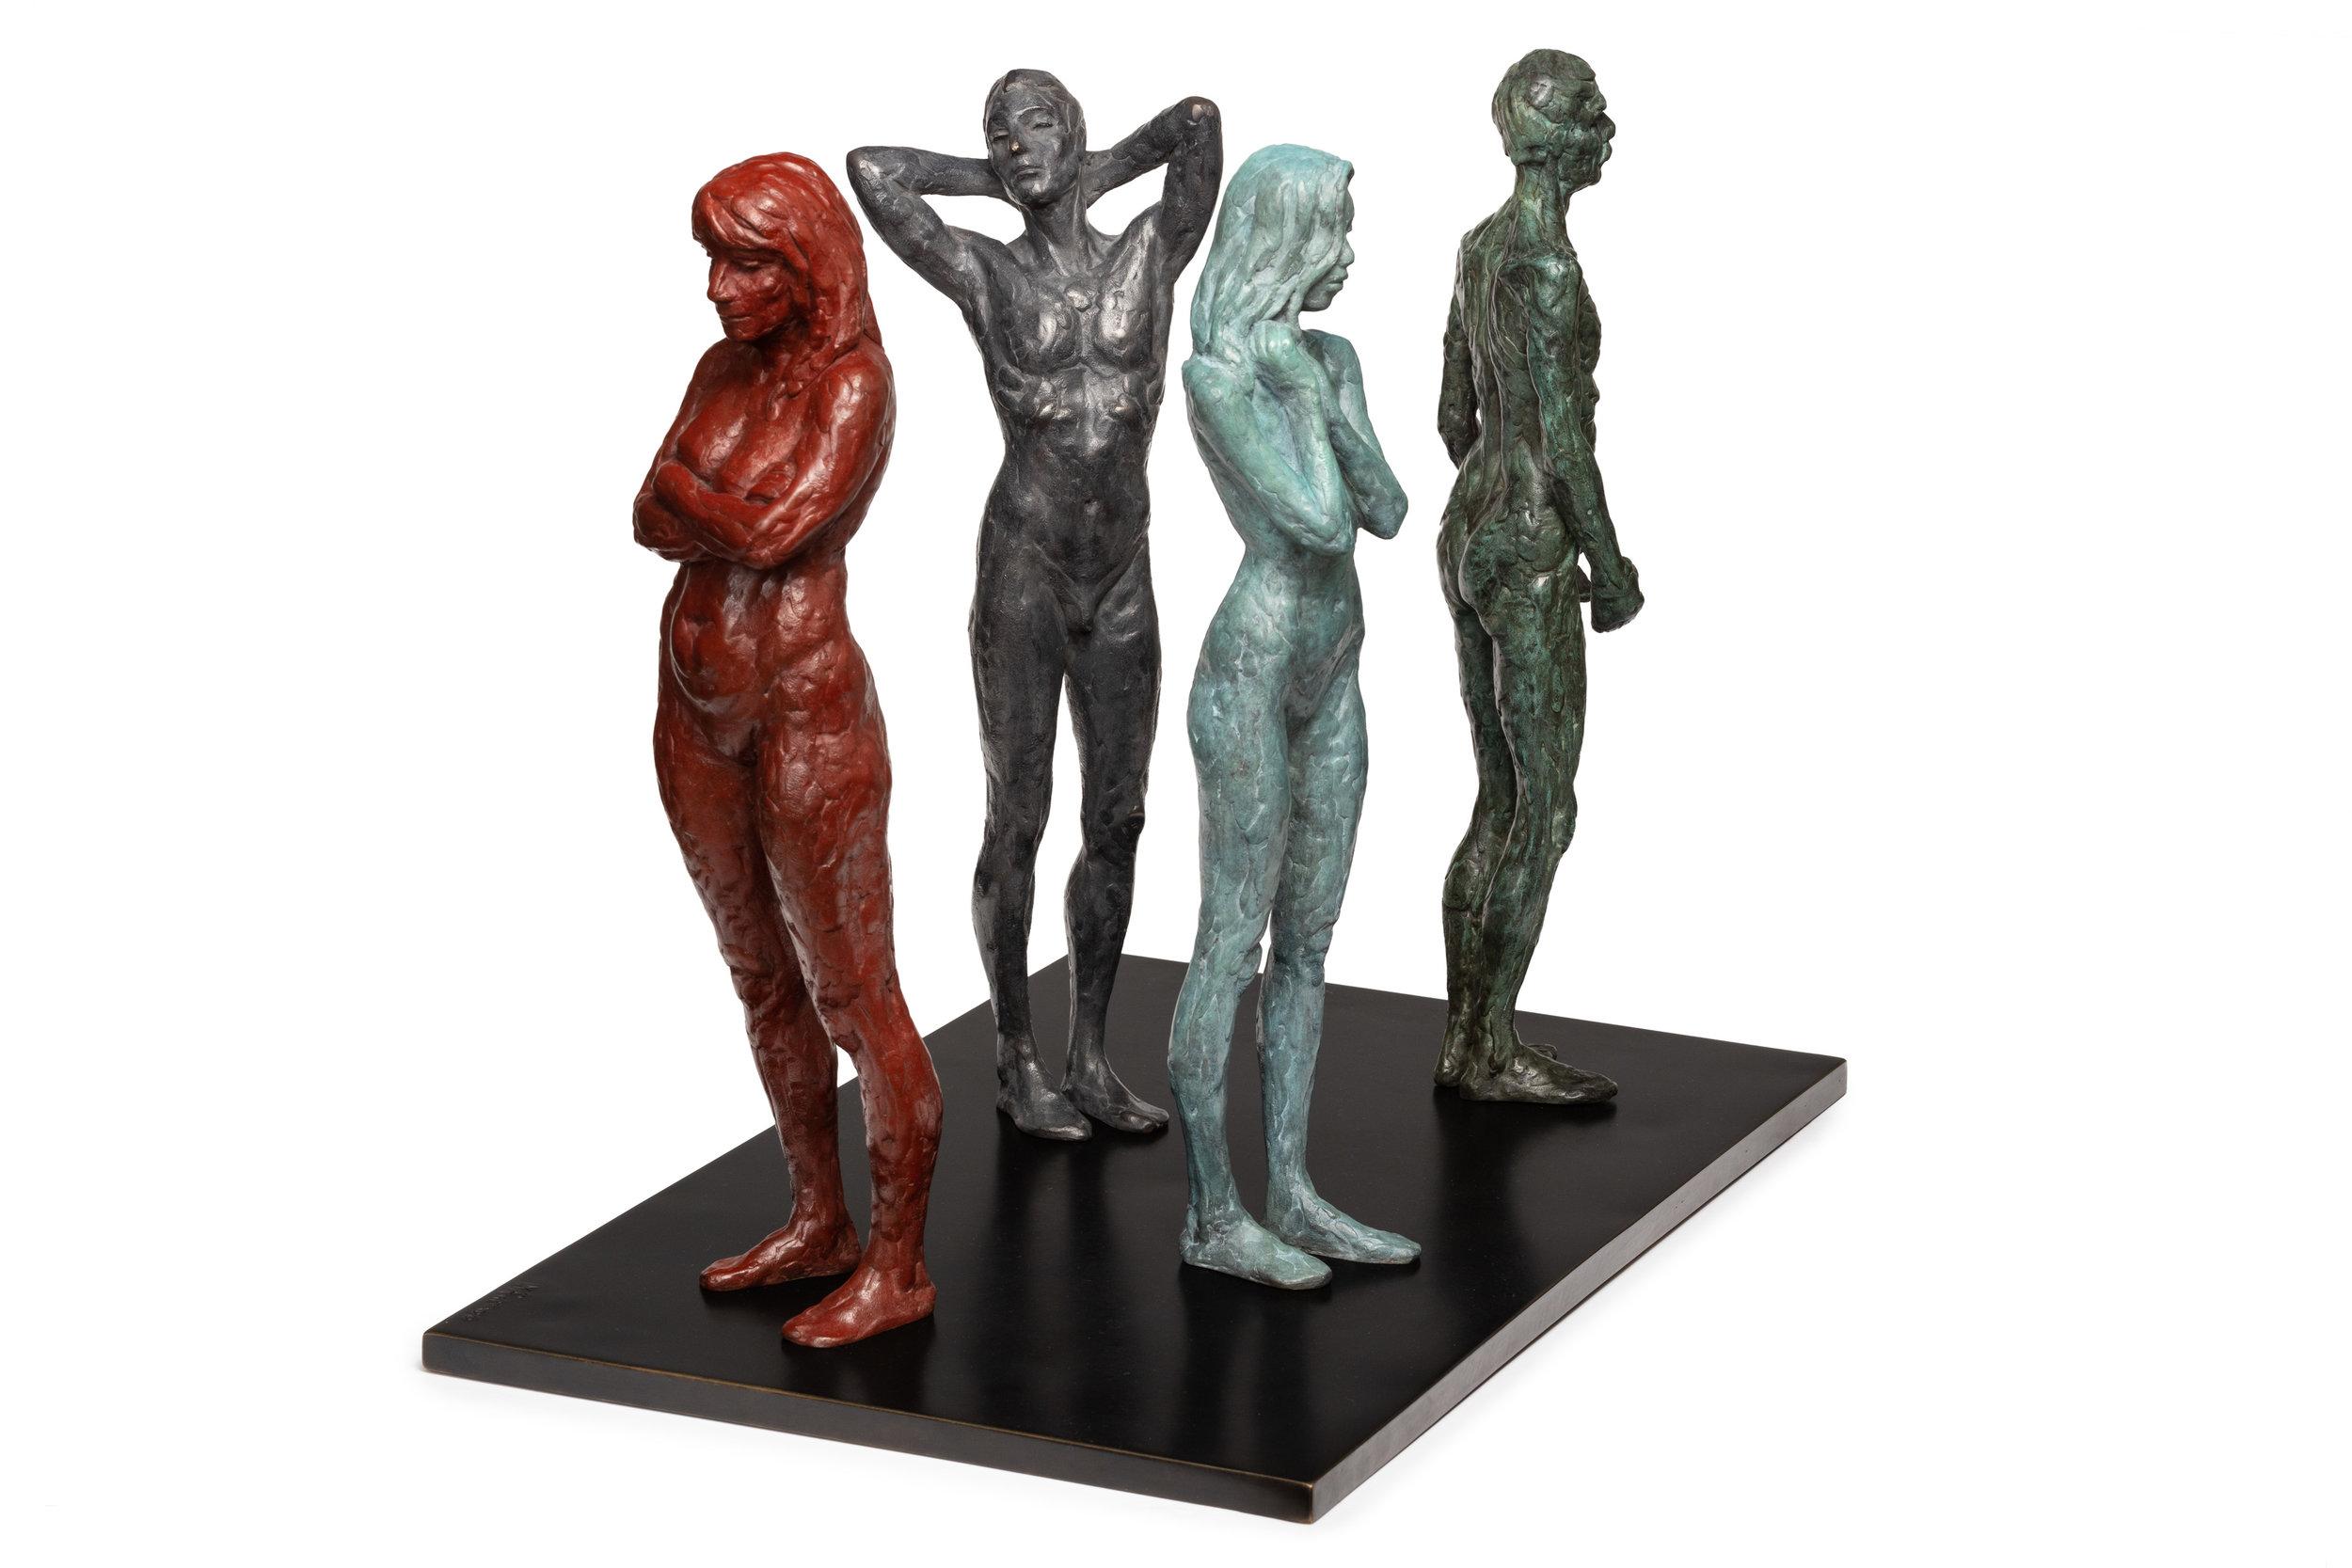 mf-figure-group-bronze-003.jpg